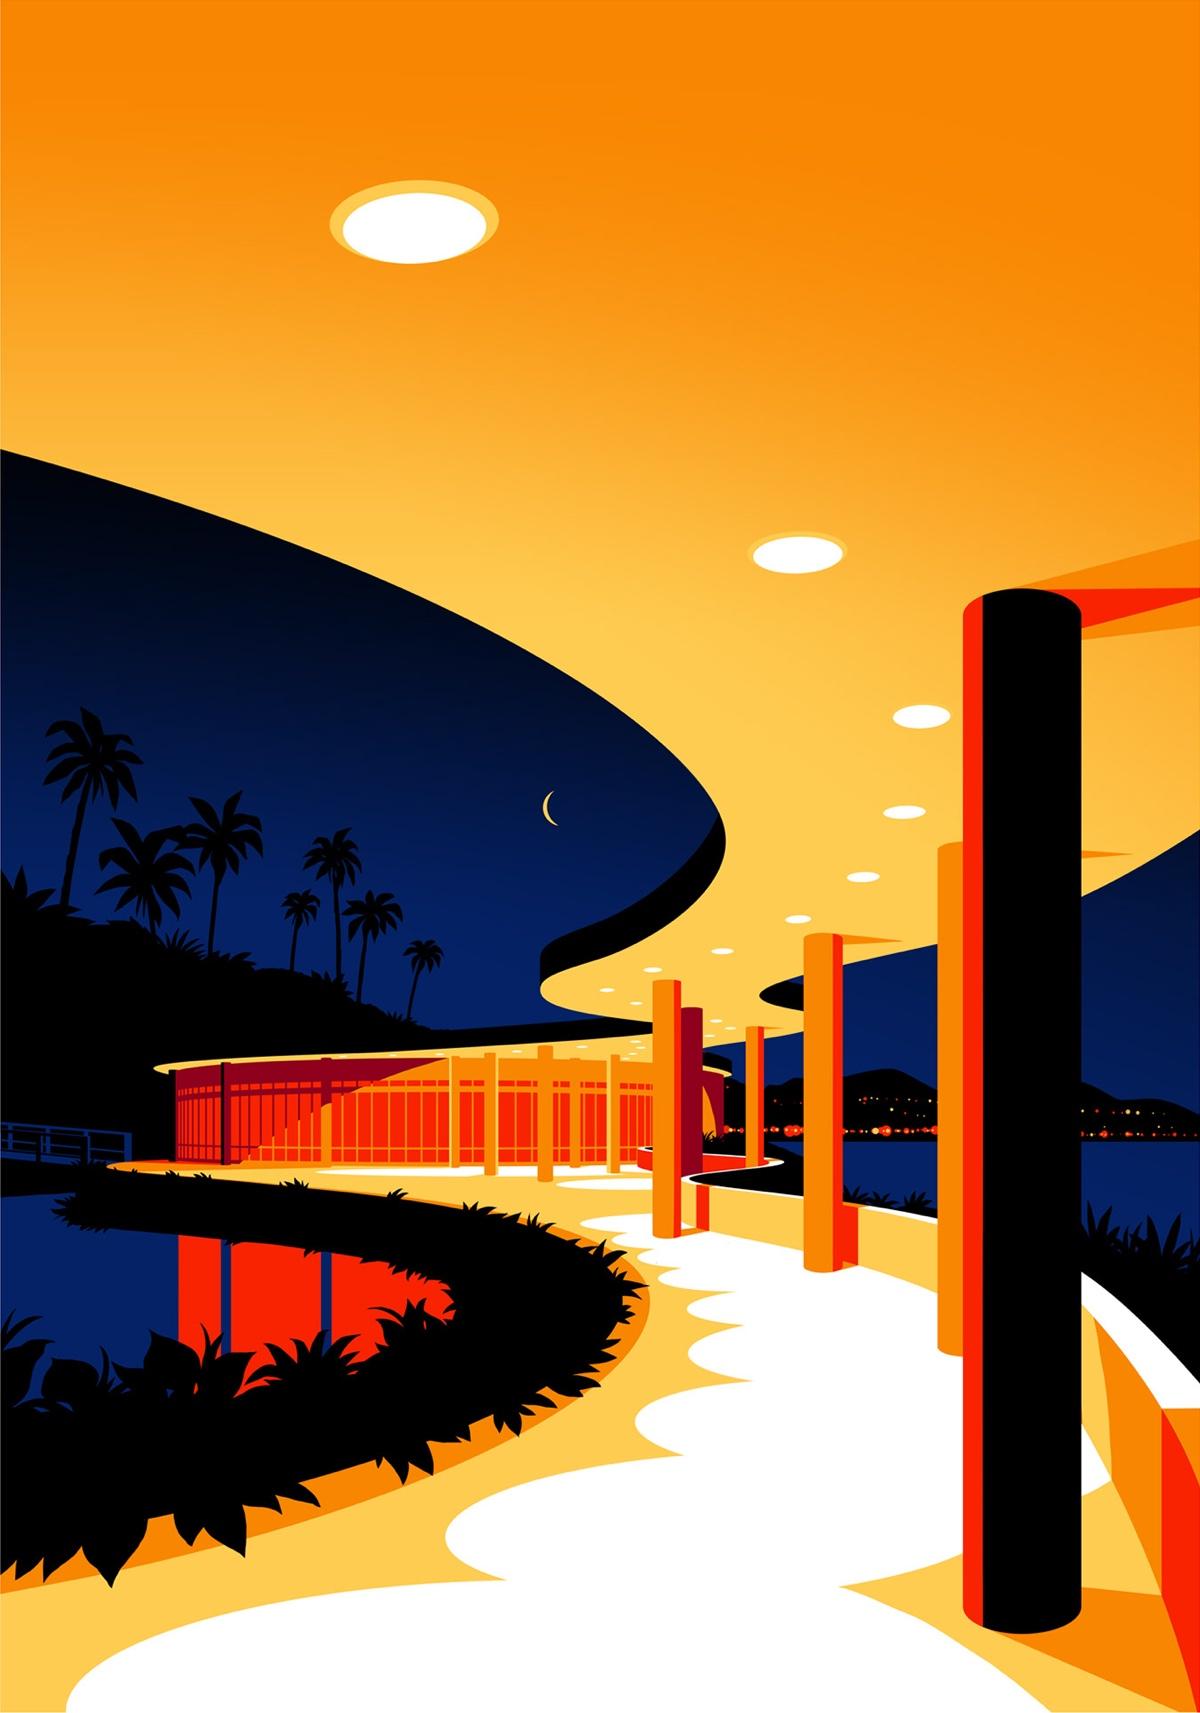 oscar-niemeyer-architecture-illustrations-levente-szabo-5